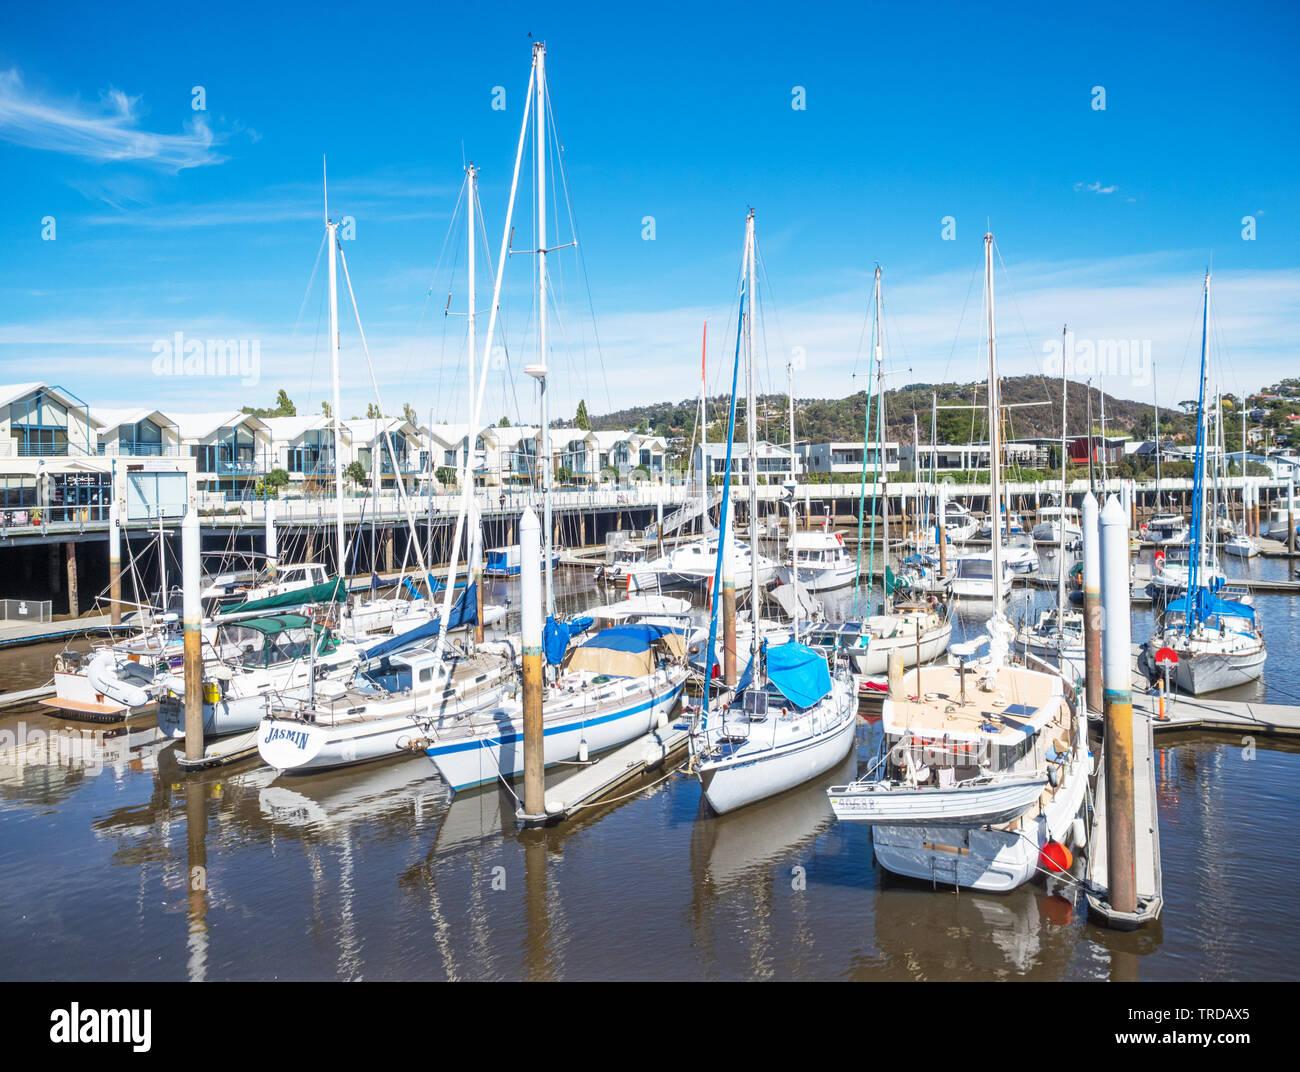 TASMANIA, AUSTRALIA - FEBRUARY 13, 2019: Pleasure craft moored in the North Esk River at Launceston Seaport in Tasmania, Australia. Stock Photo